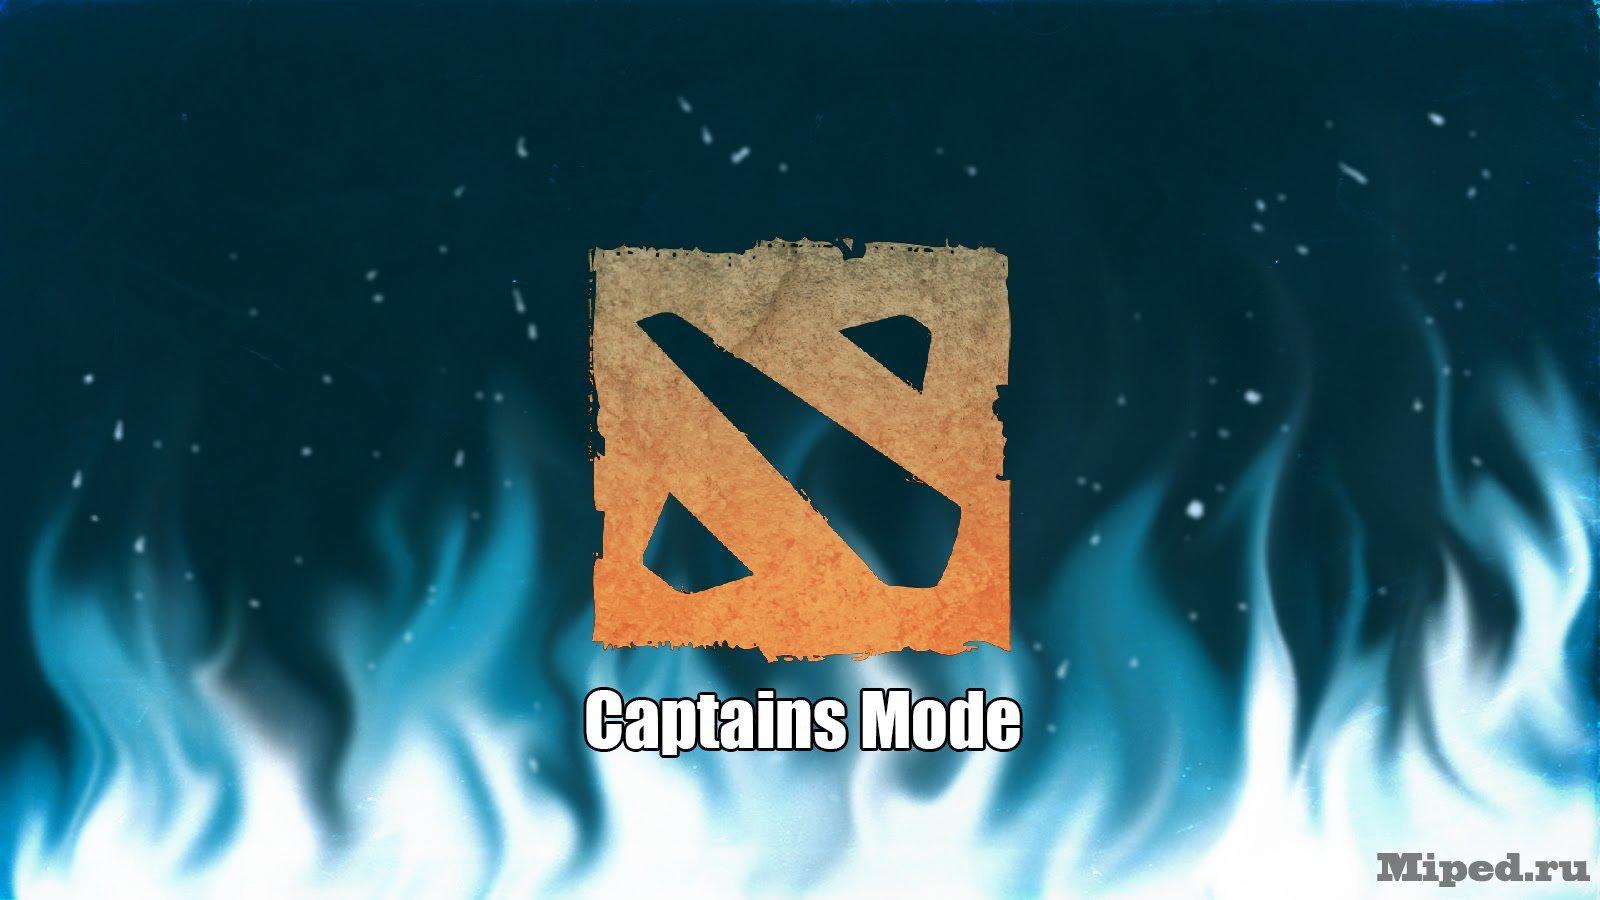 герои в капитан моде дота 2